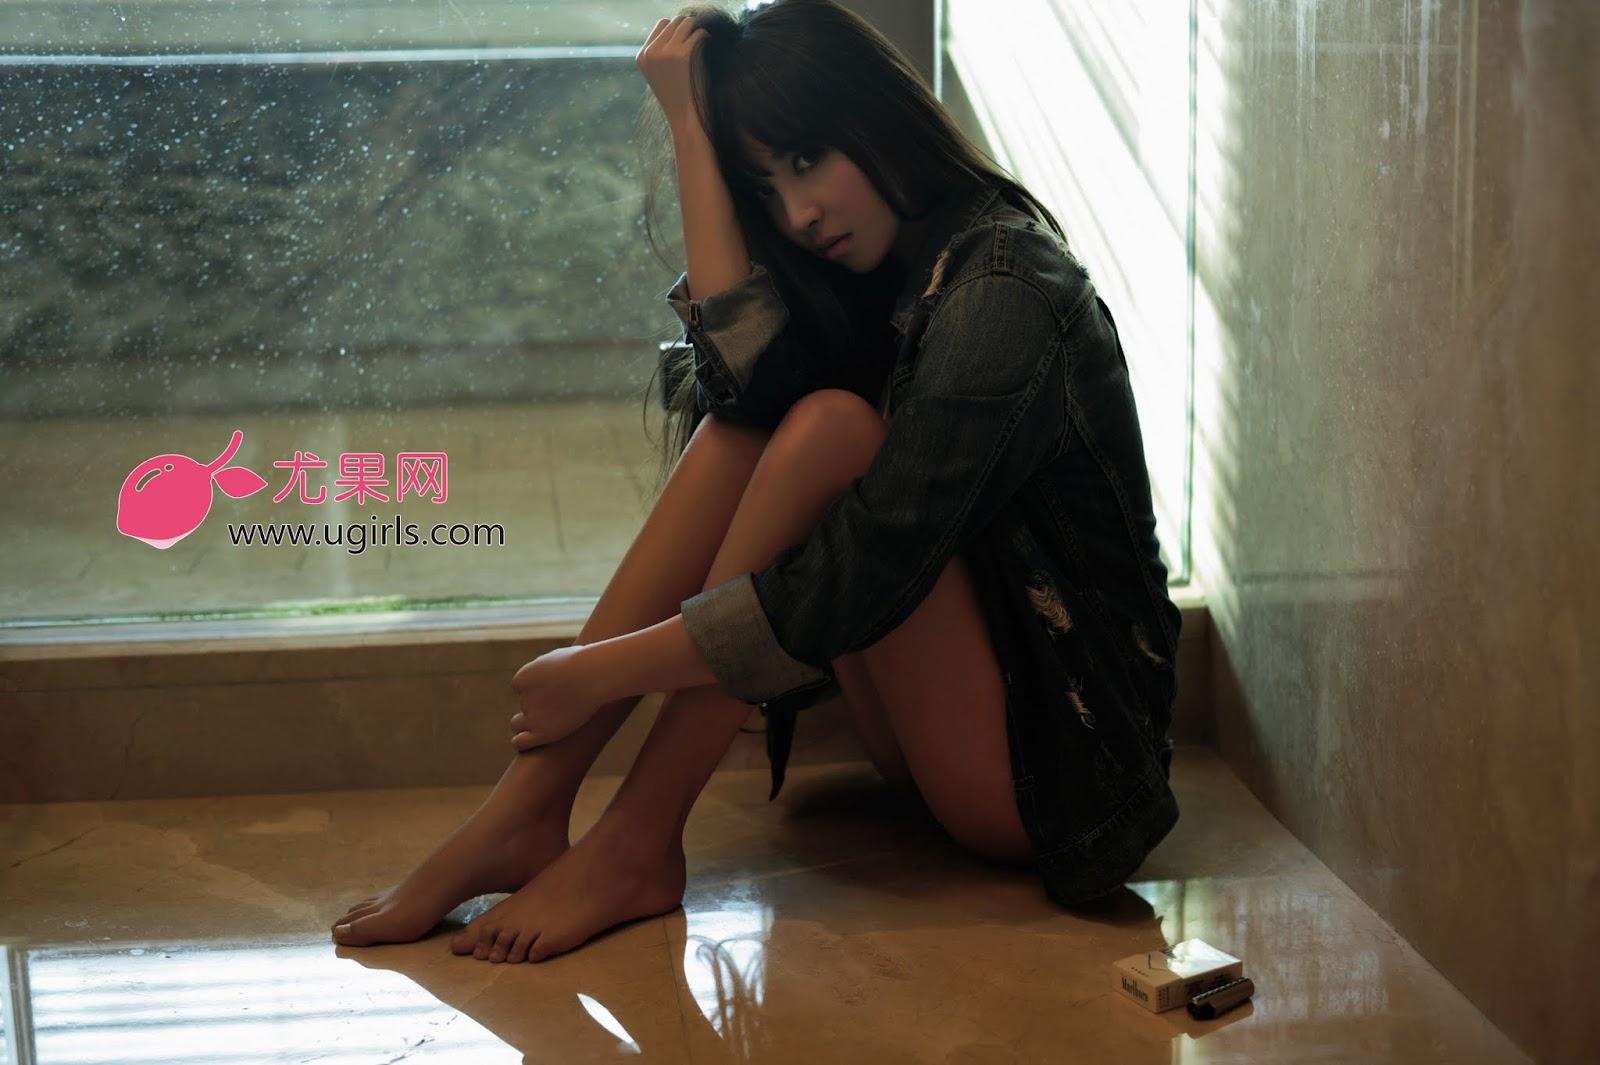 DLS 4761 3 - Hot Girl Model UGIRLS NO.13